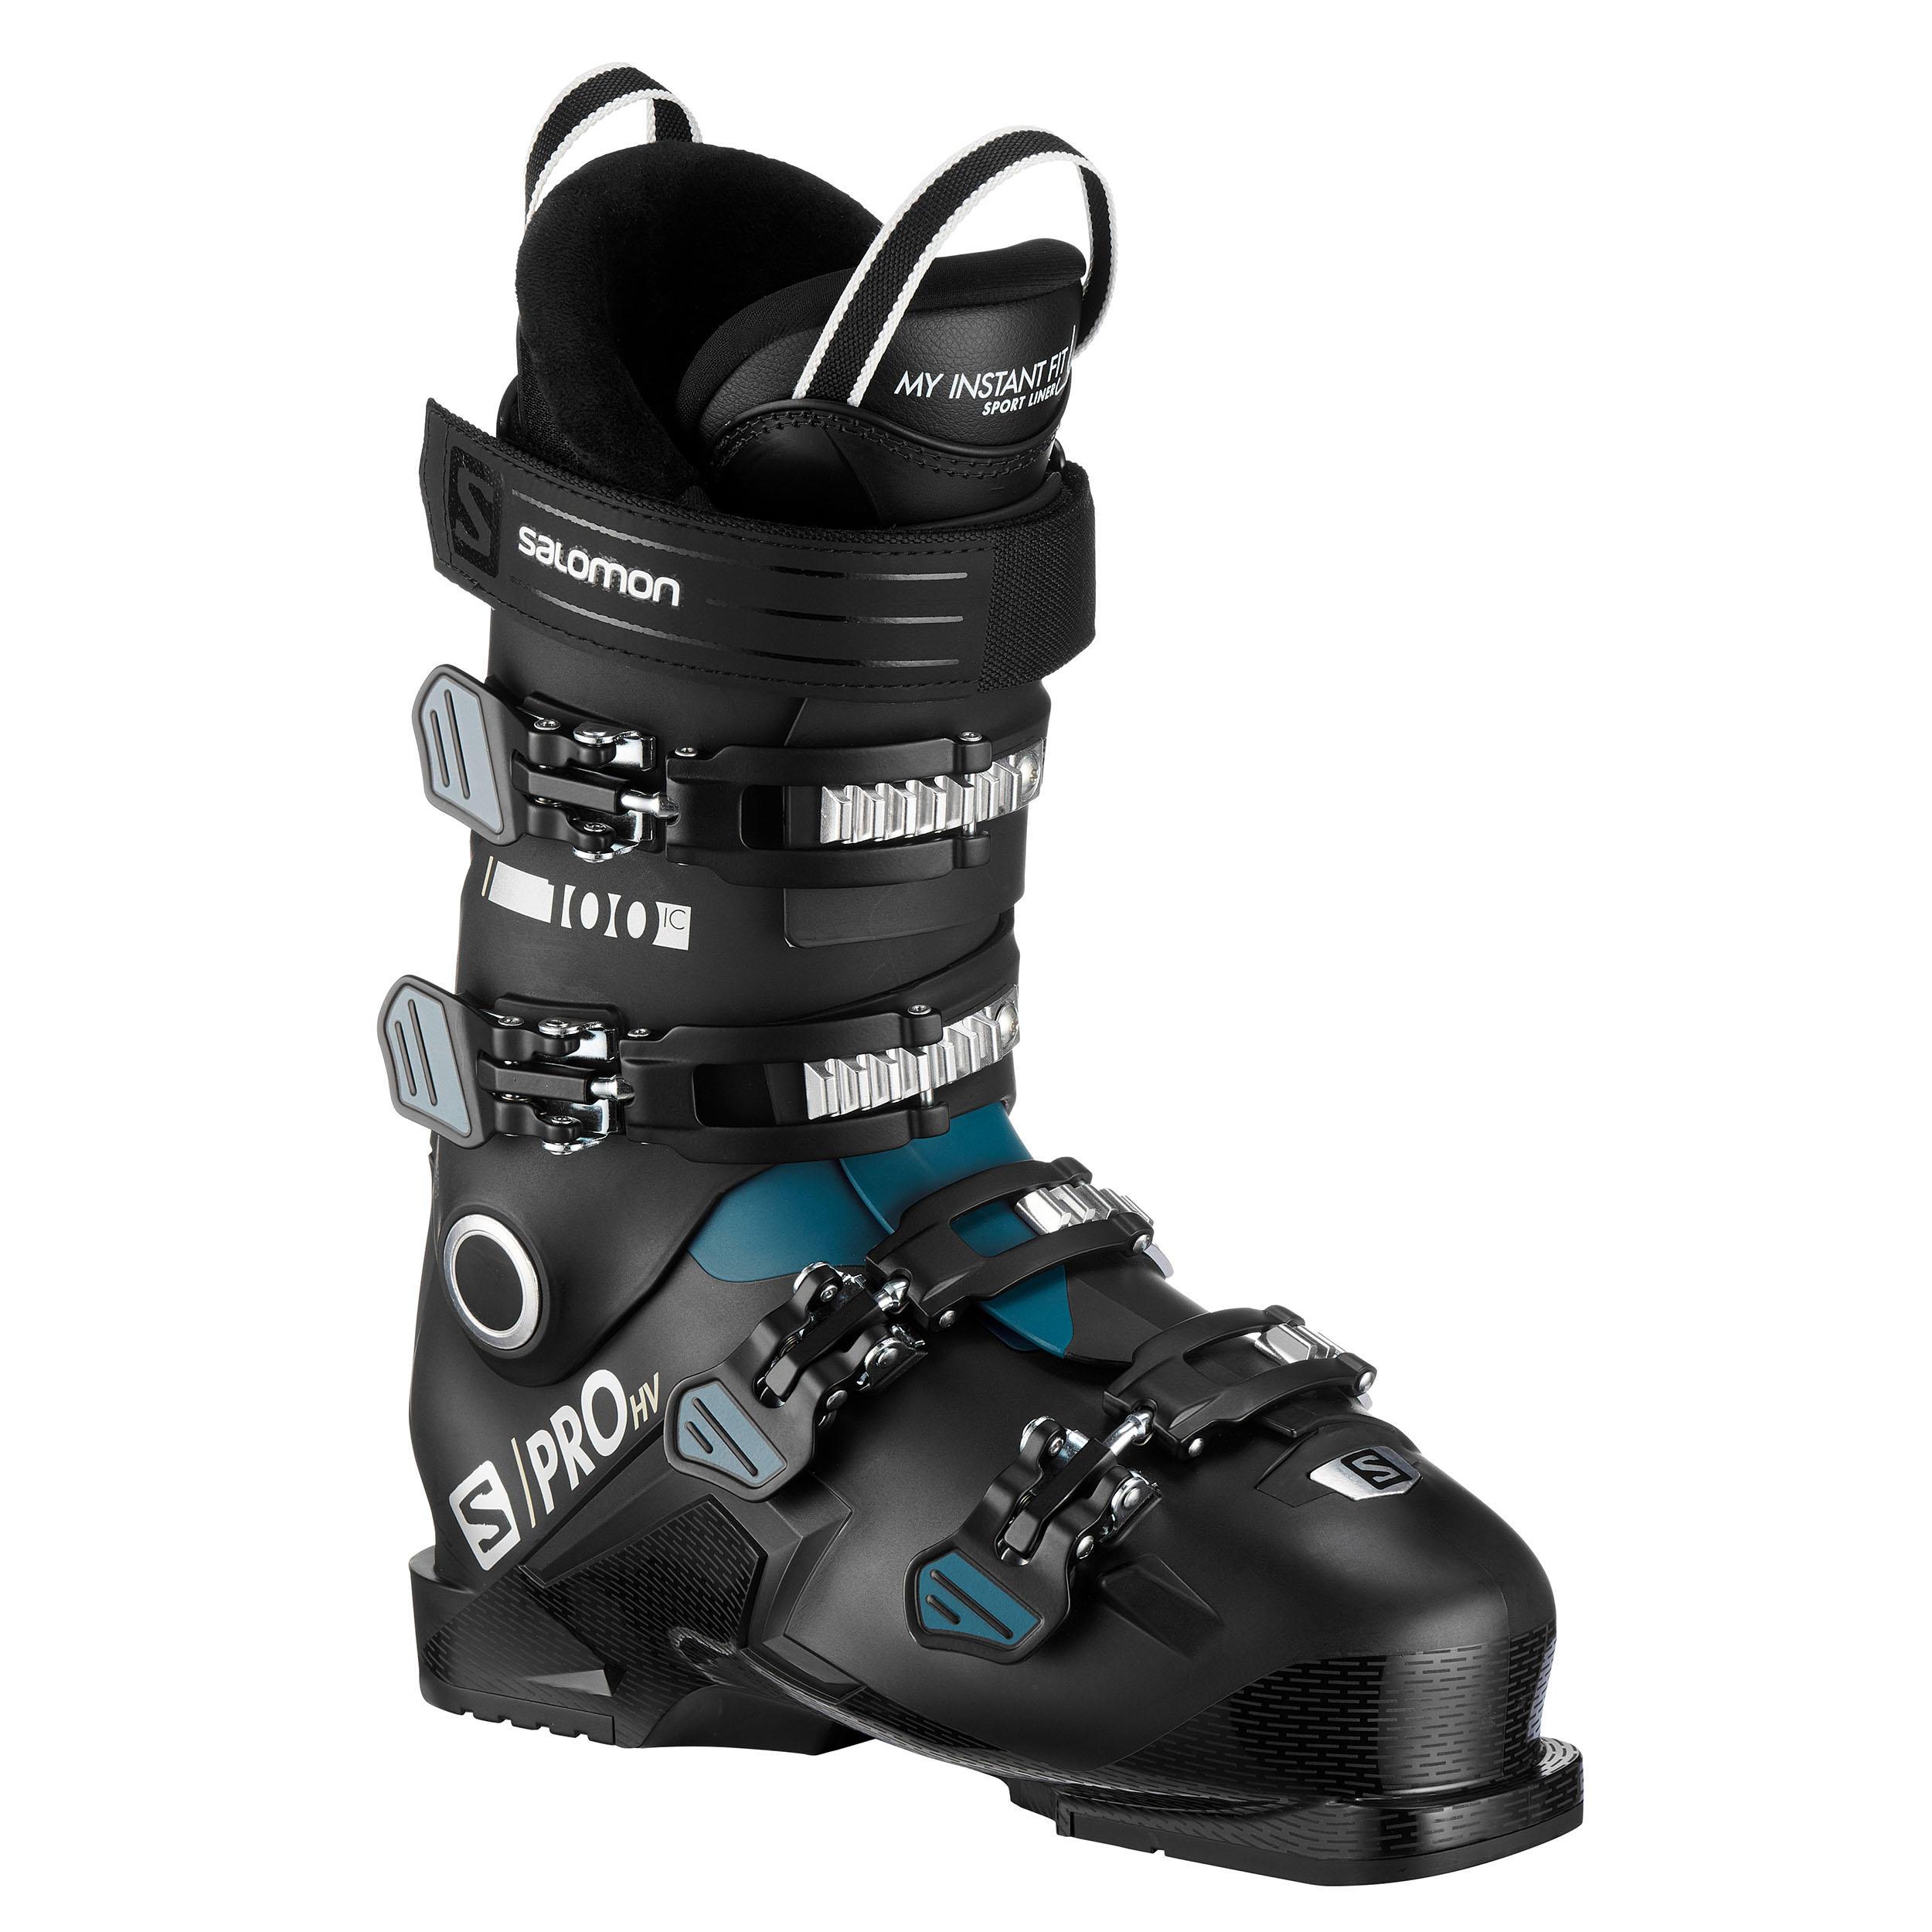 Clăpari schi Salomon SPRO 100